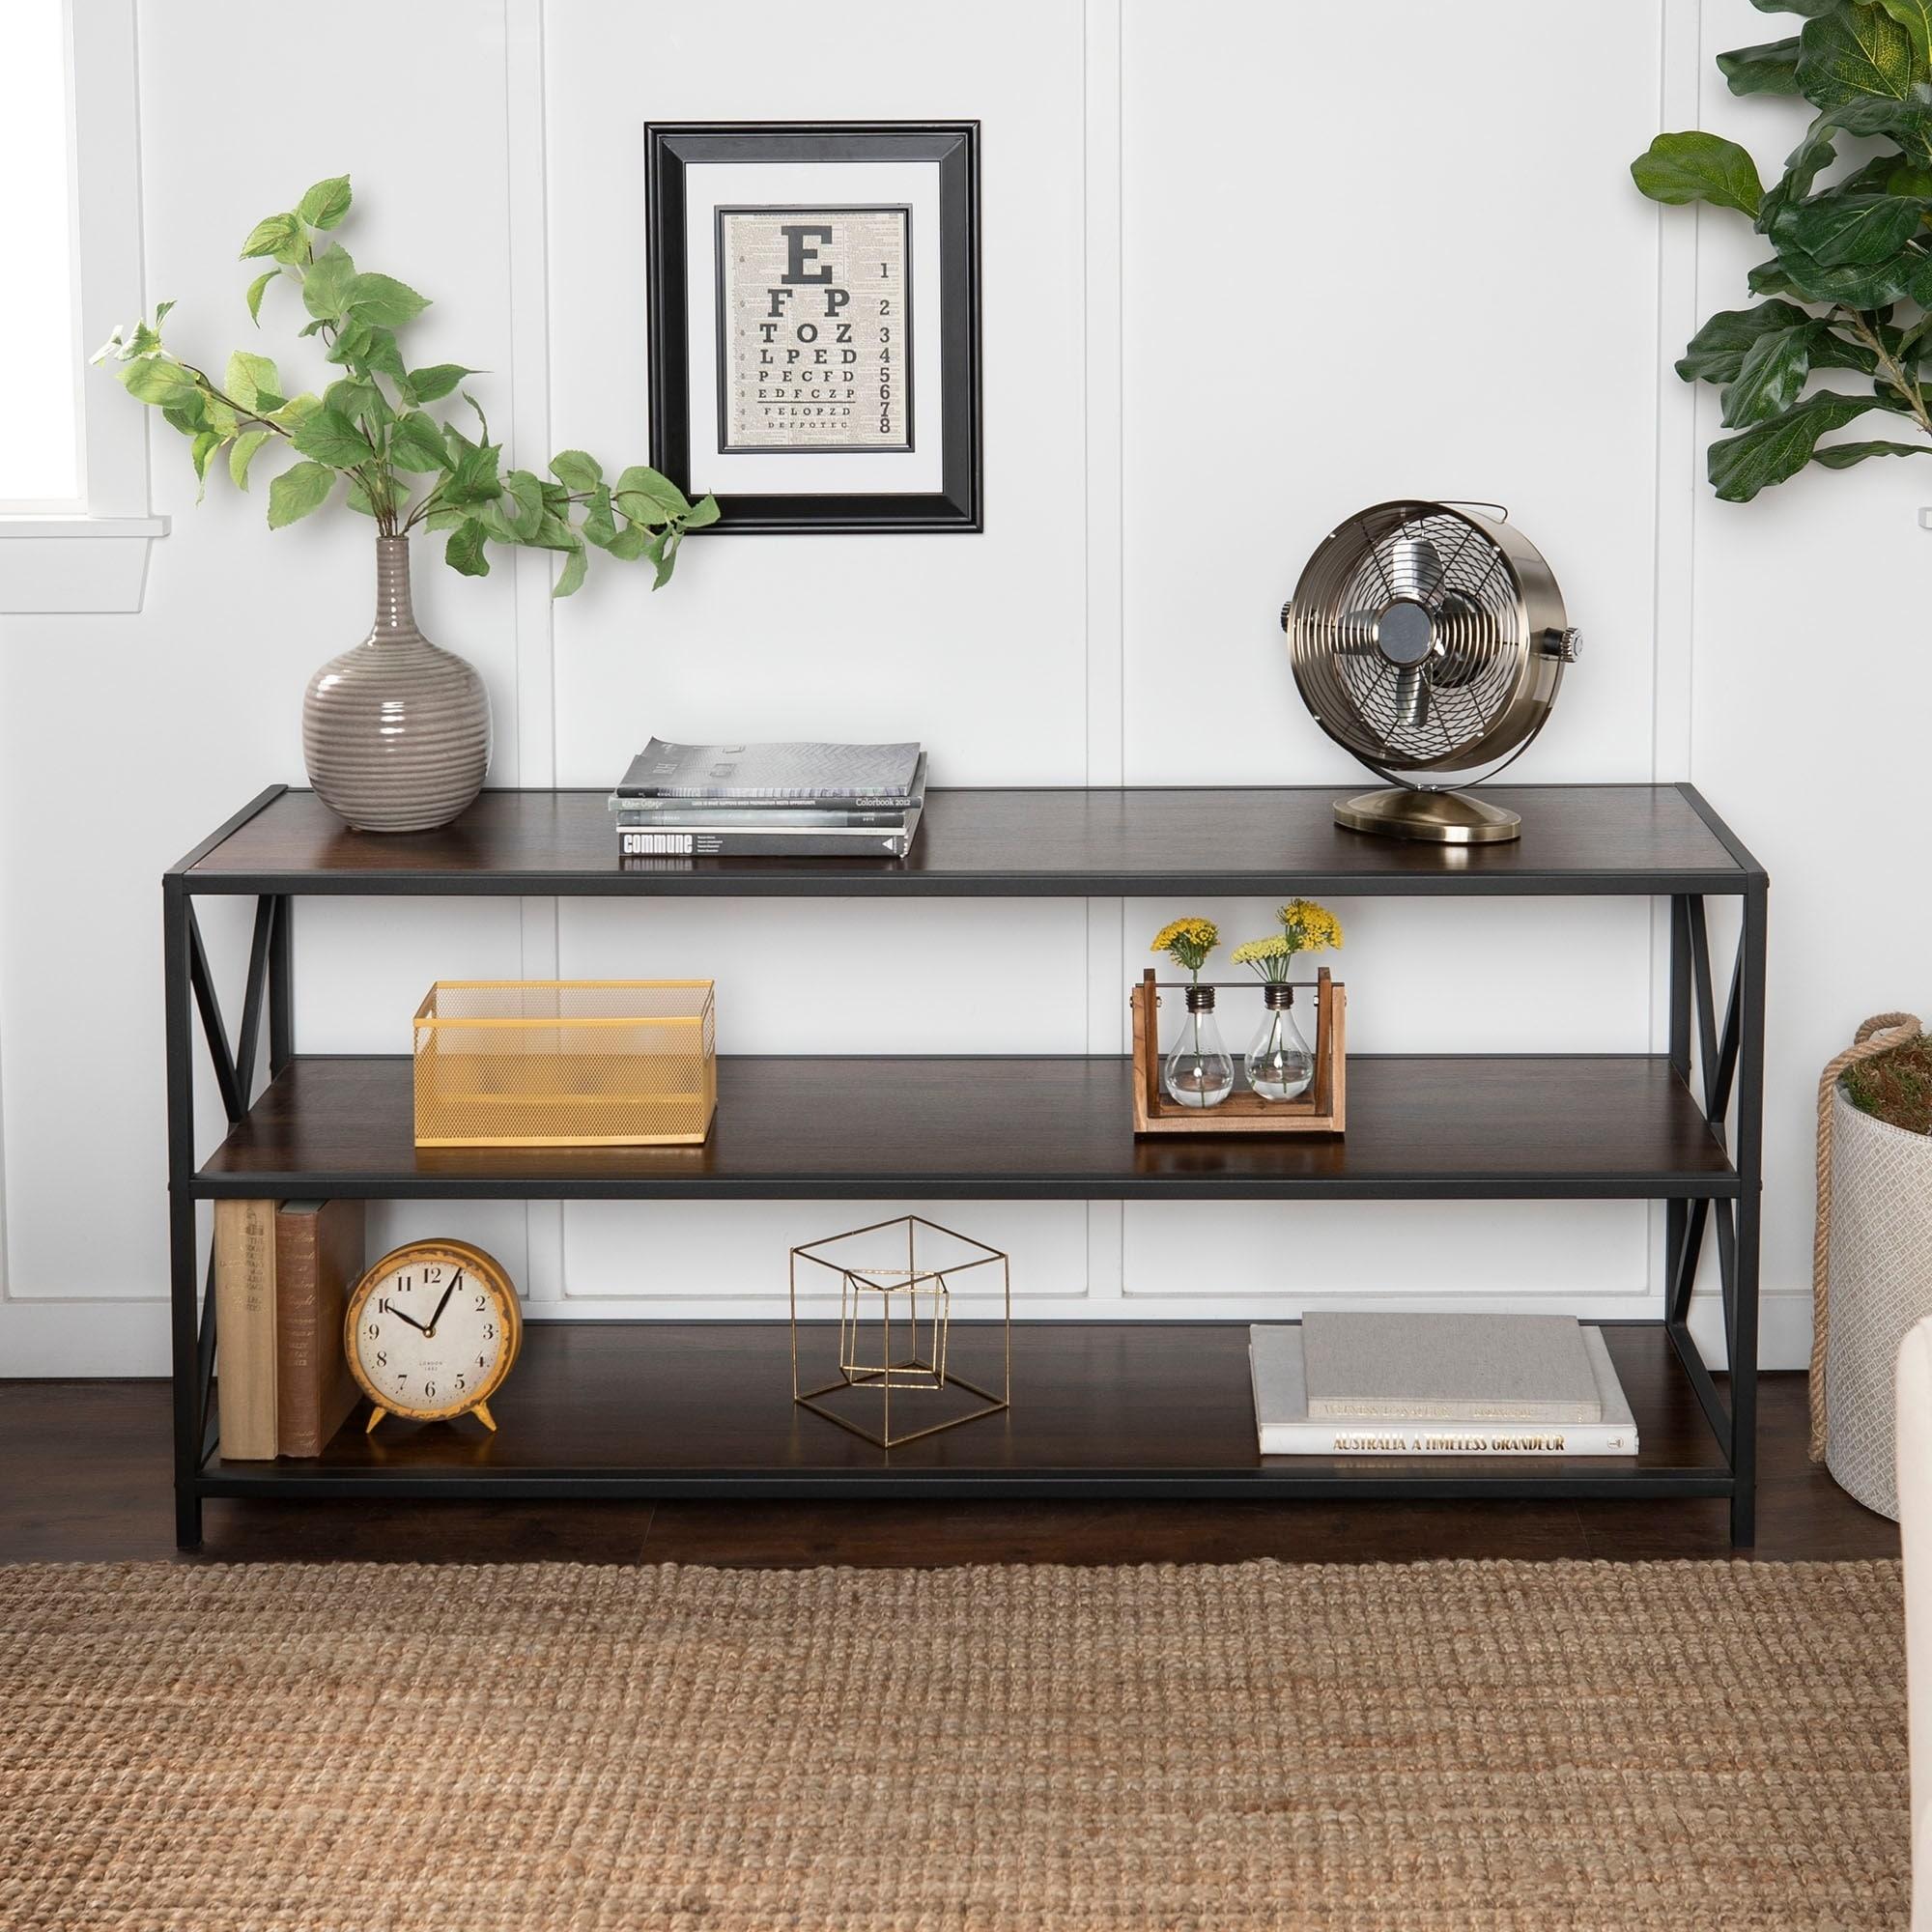 Carbon Loft 60-inch Hattie X-frame Media Bookshelf, Modern TV Stand for  Living Room, Entryway - 60 x 16 x 26h